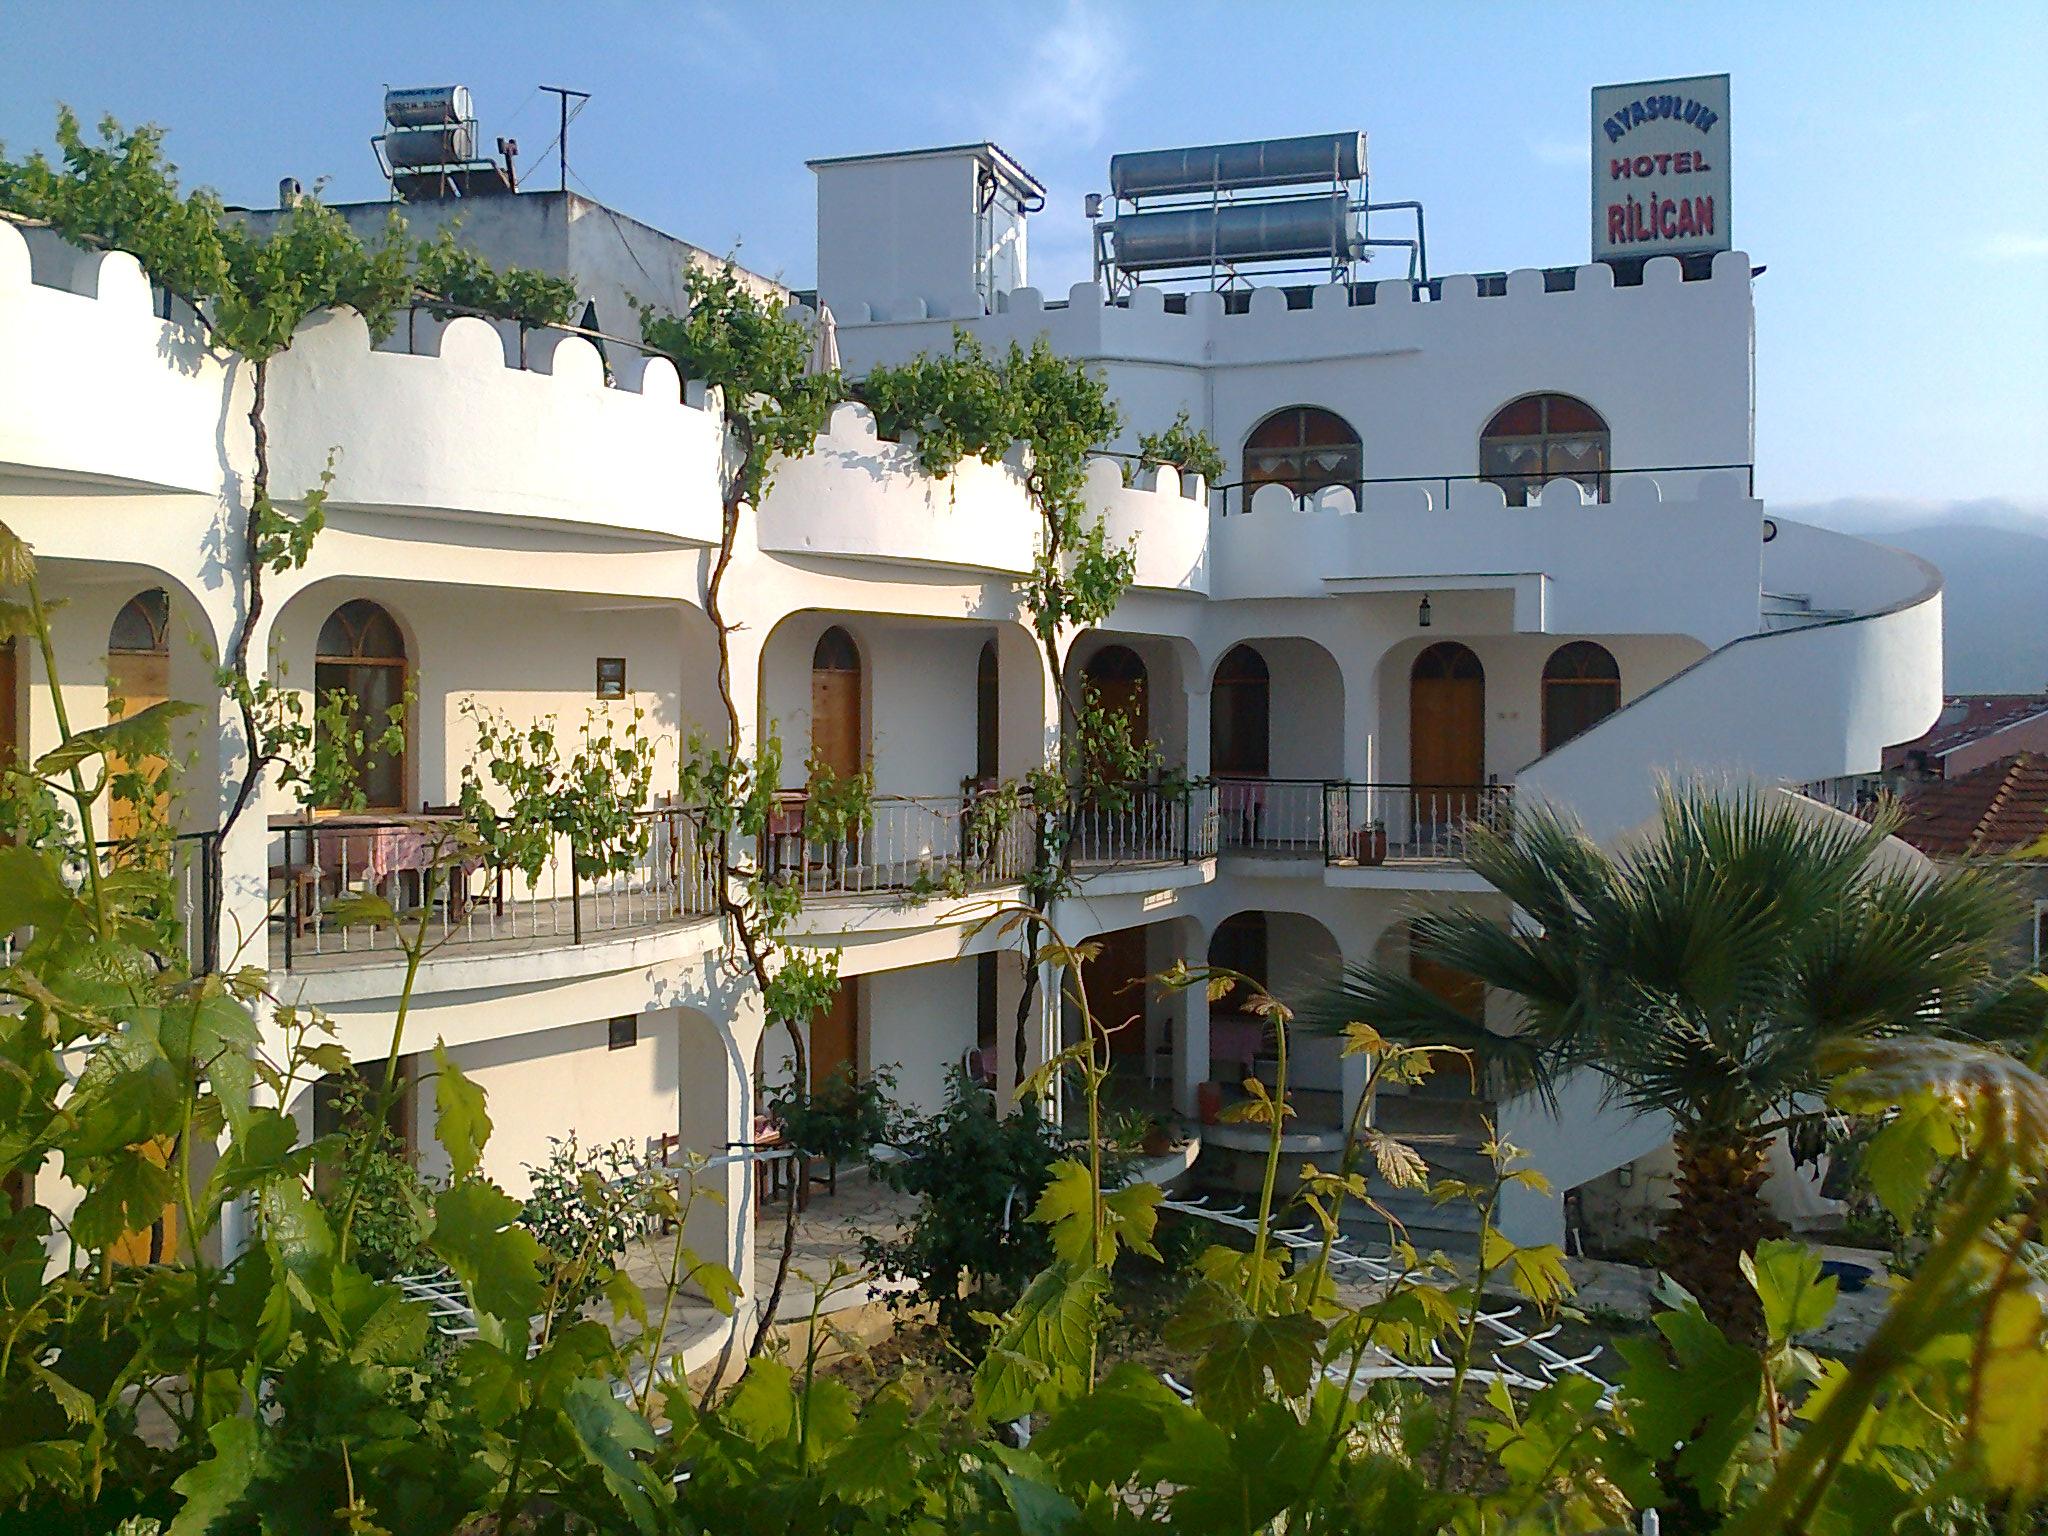 Rilican Hotel